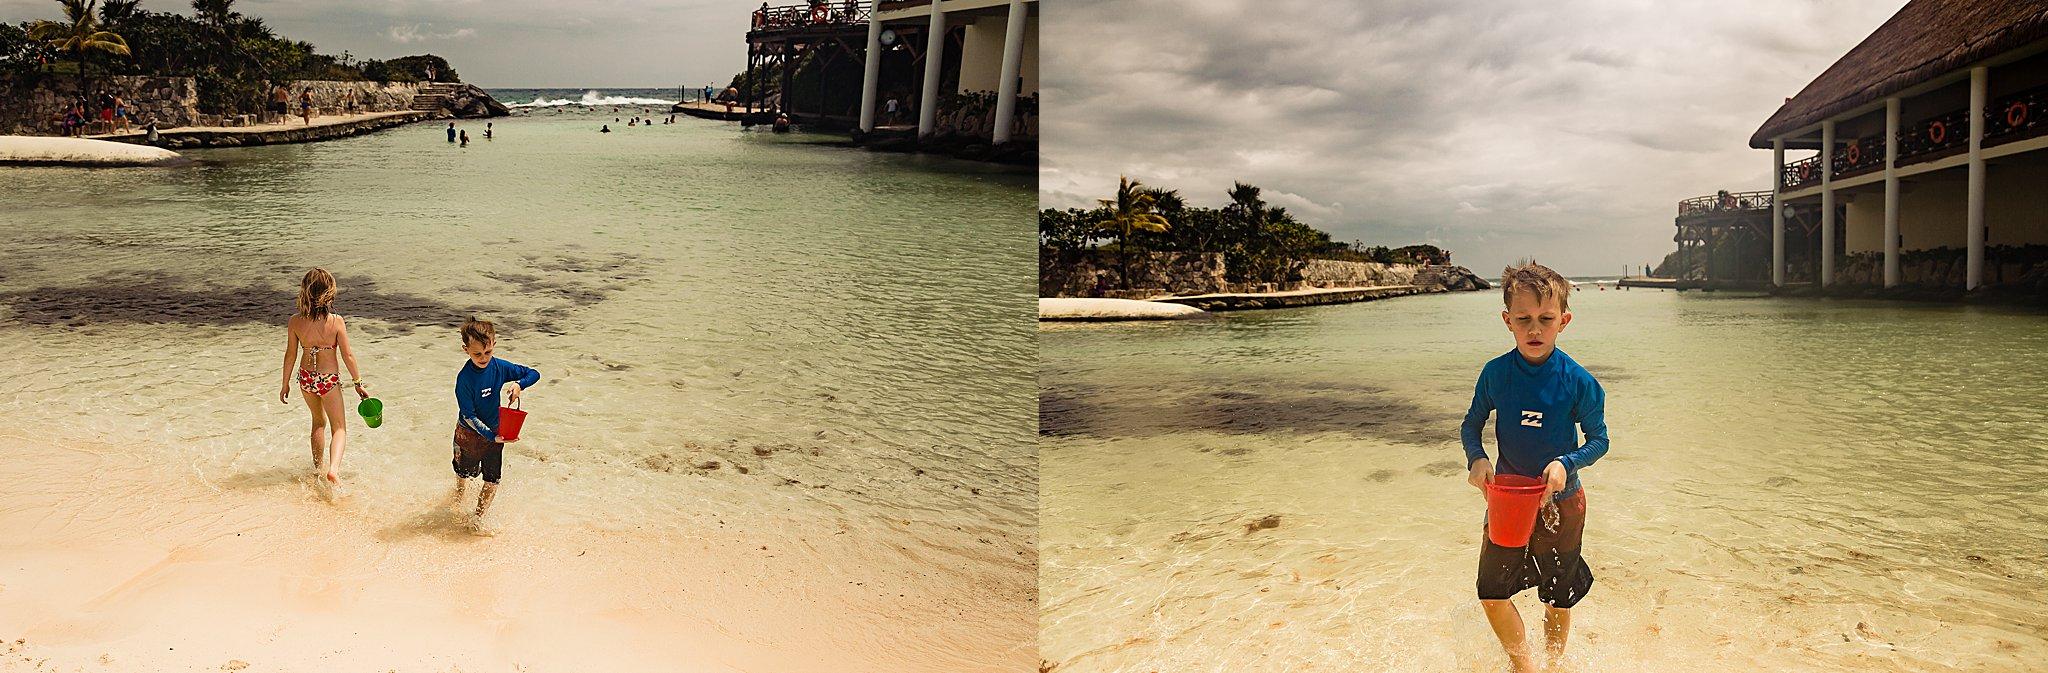 Mexico Vacation 2019 Anna Hurley Photography 40.jpg